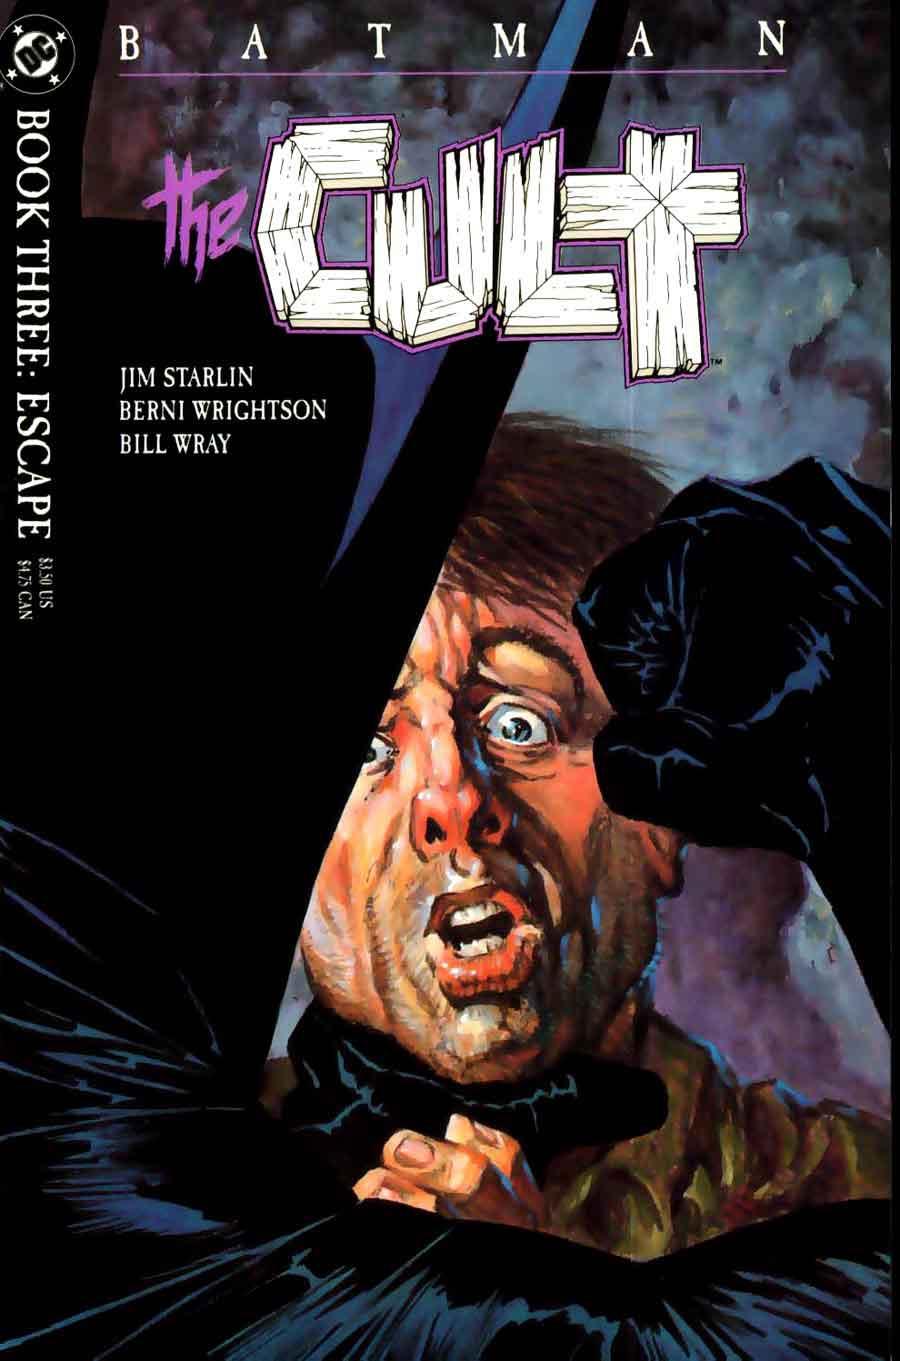 UN POCO DE NOVENO ARTE - Página 2 Batman-the-cult-03-01